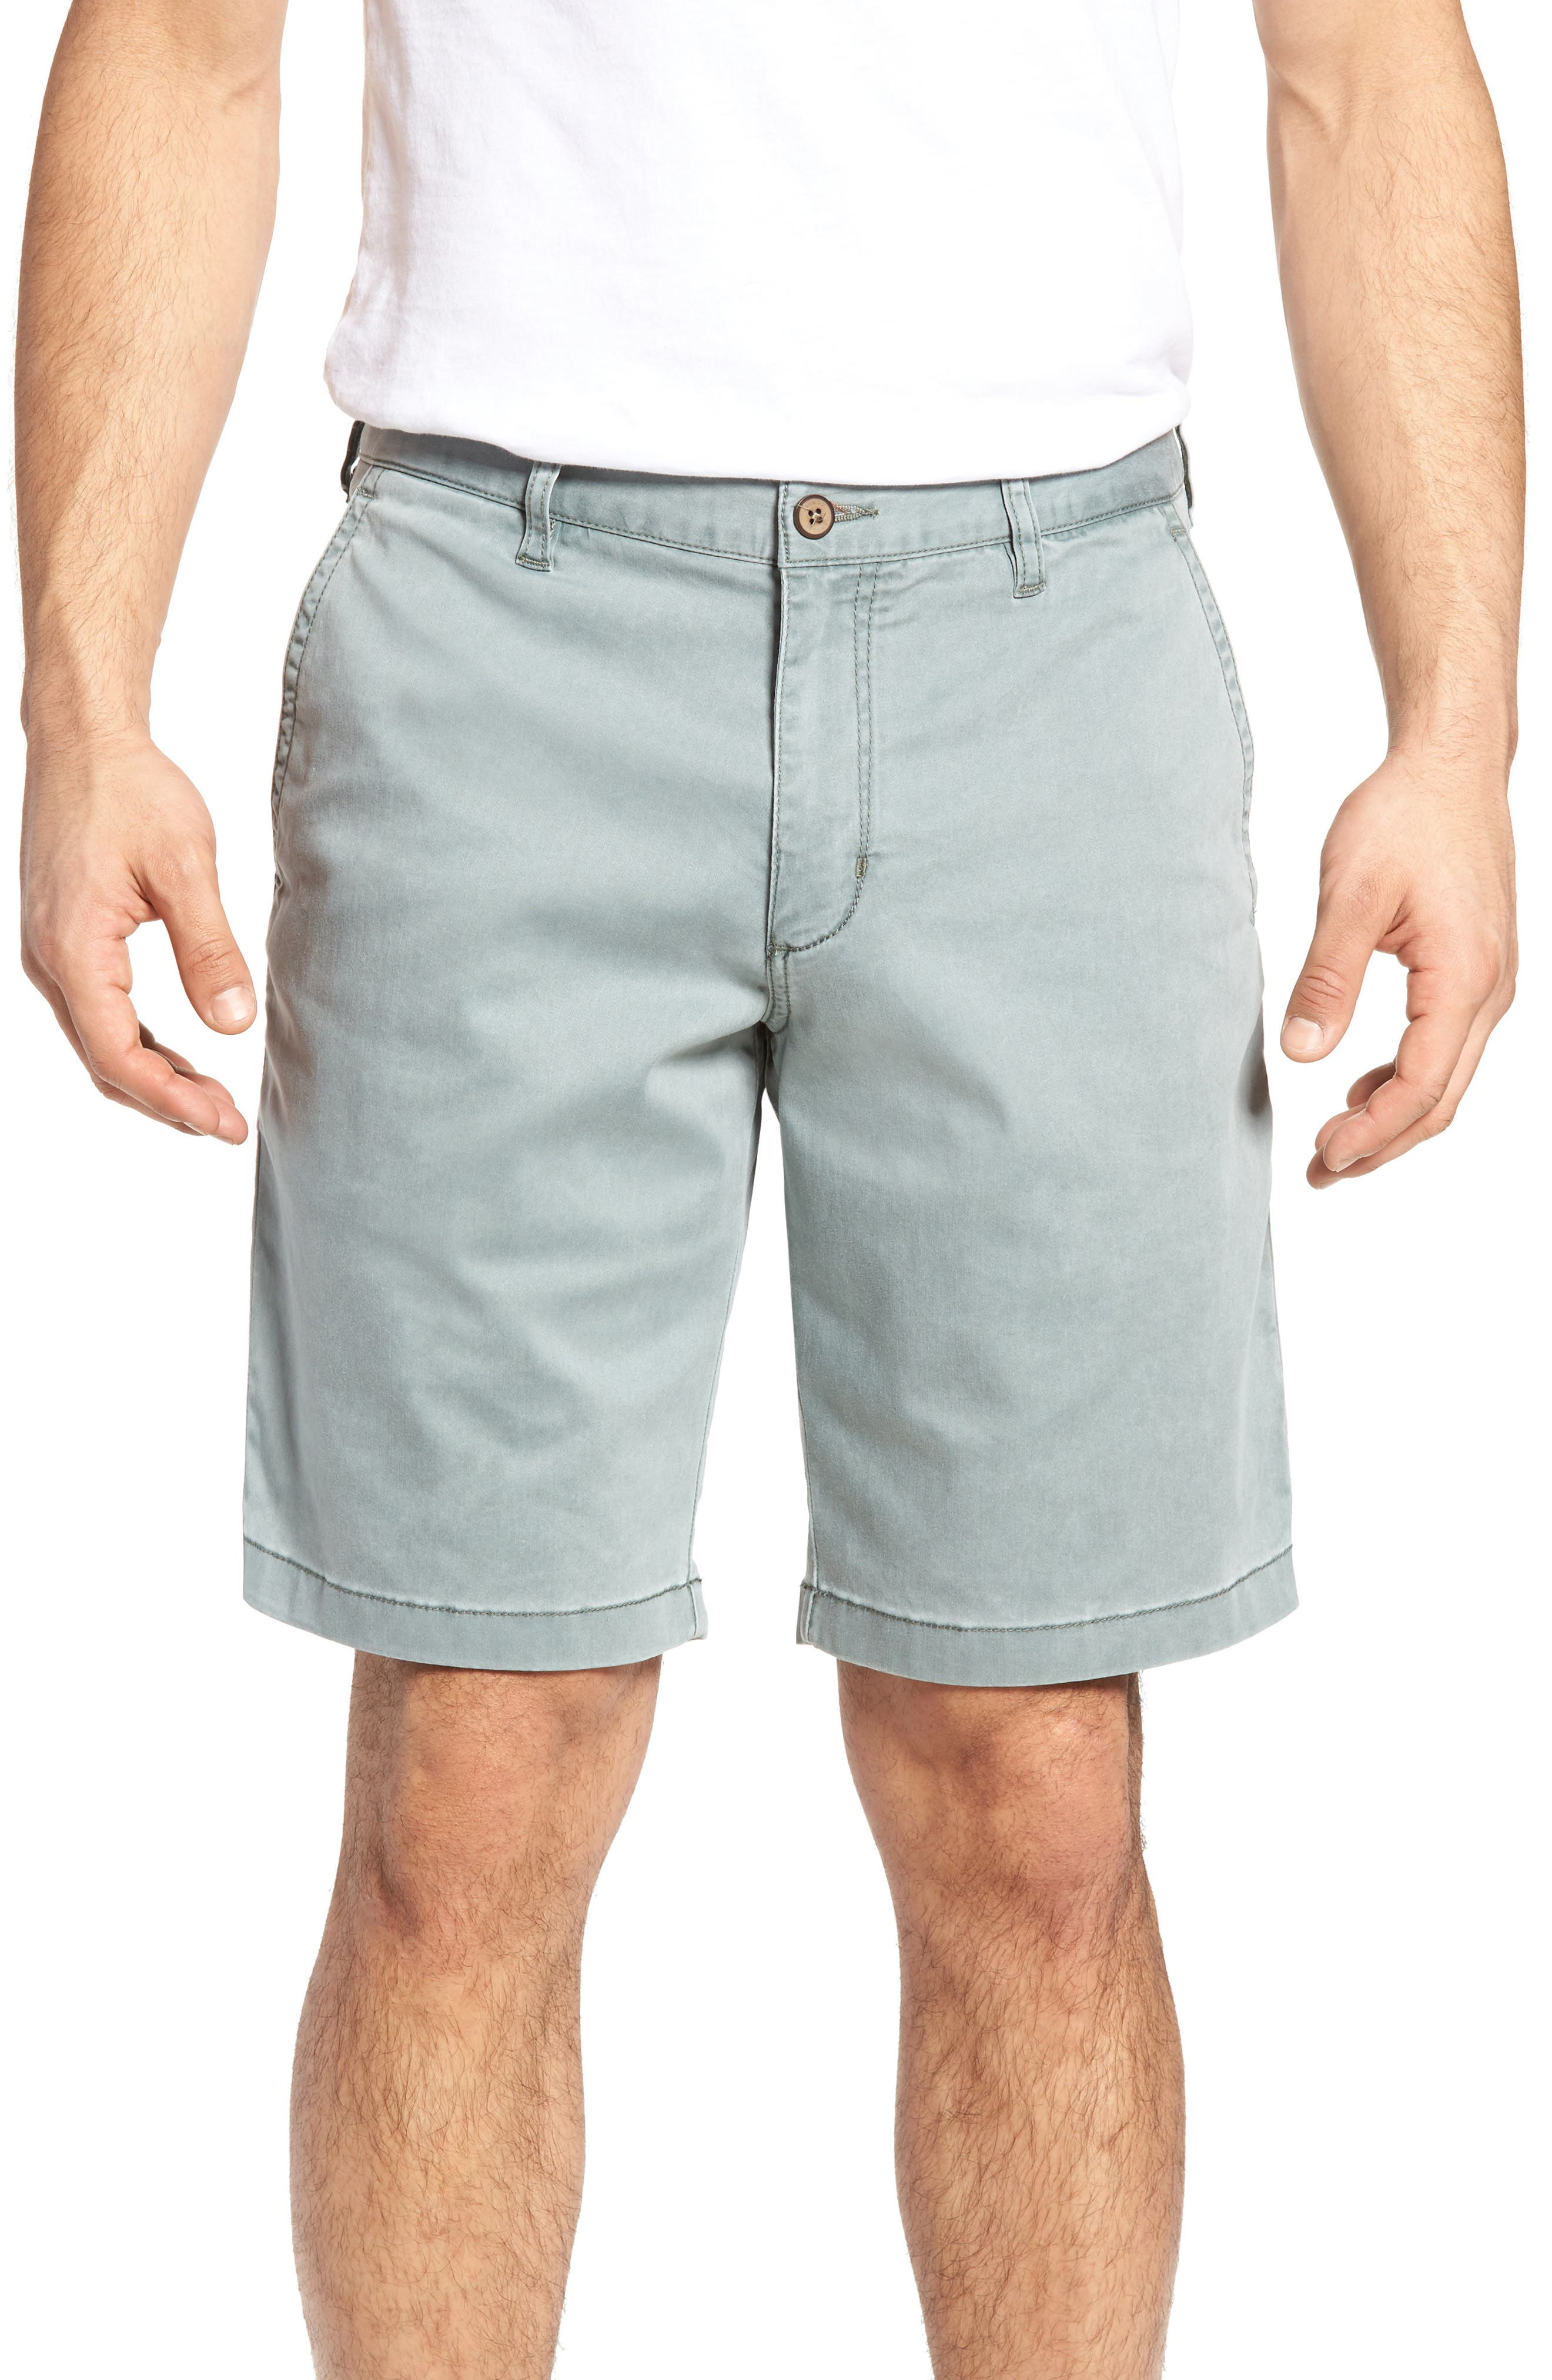 Boracay Chino Shorts,                             Main thumbnail 8, color,